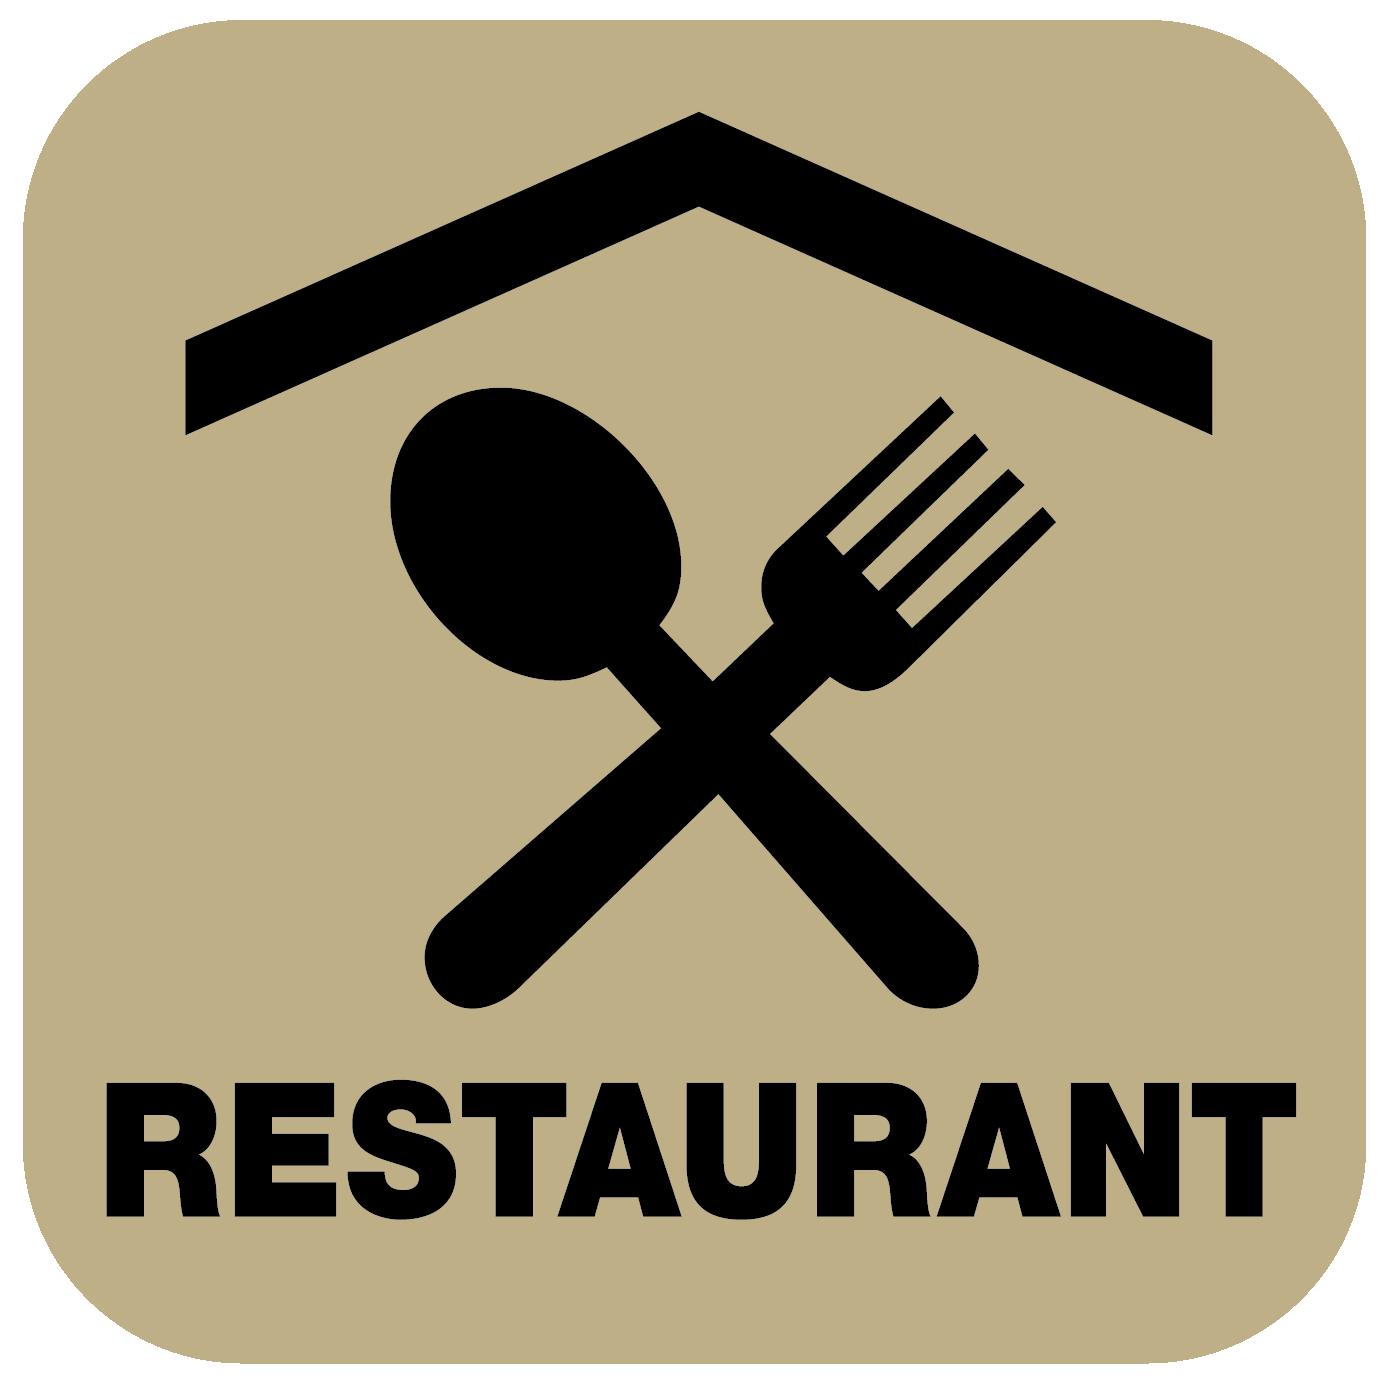 Restaurant à vendre - 633.0 m2 - 29 - Finistere